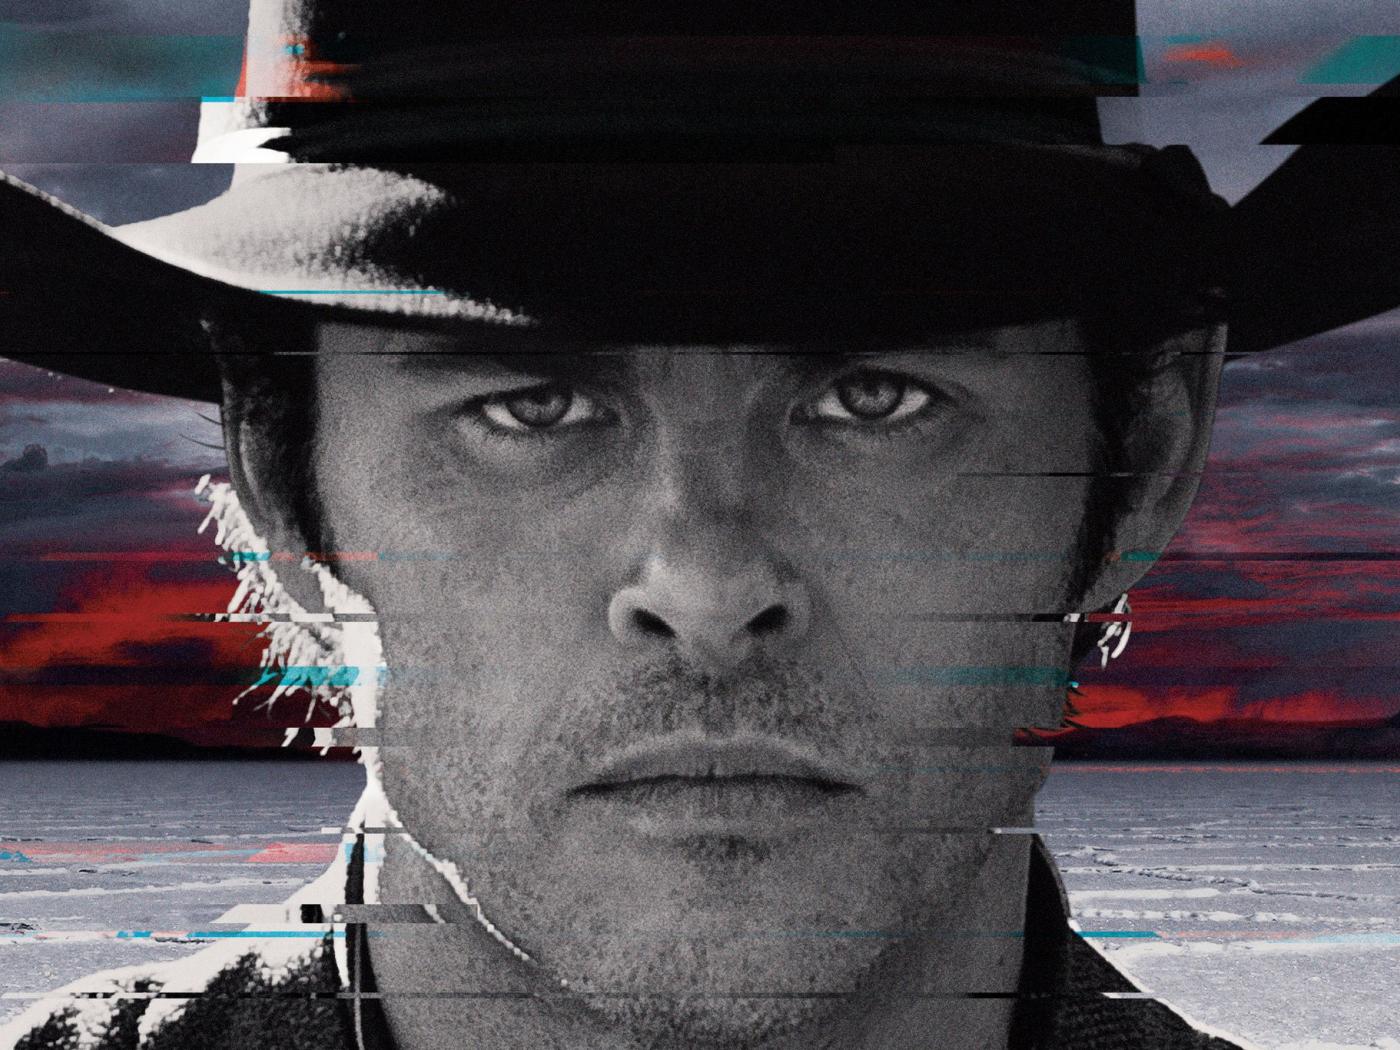 James Marsden, Teddy Flood, Westworld, season 2, tv show, 1400x1050 wallpaper